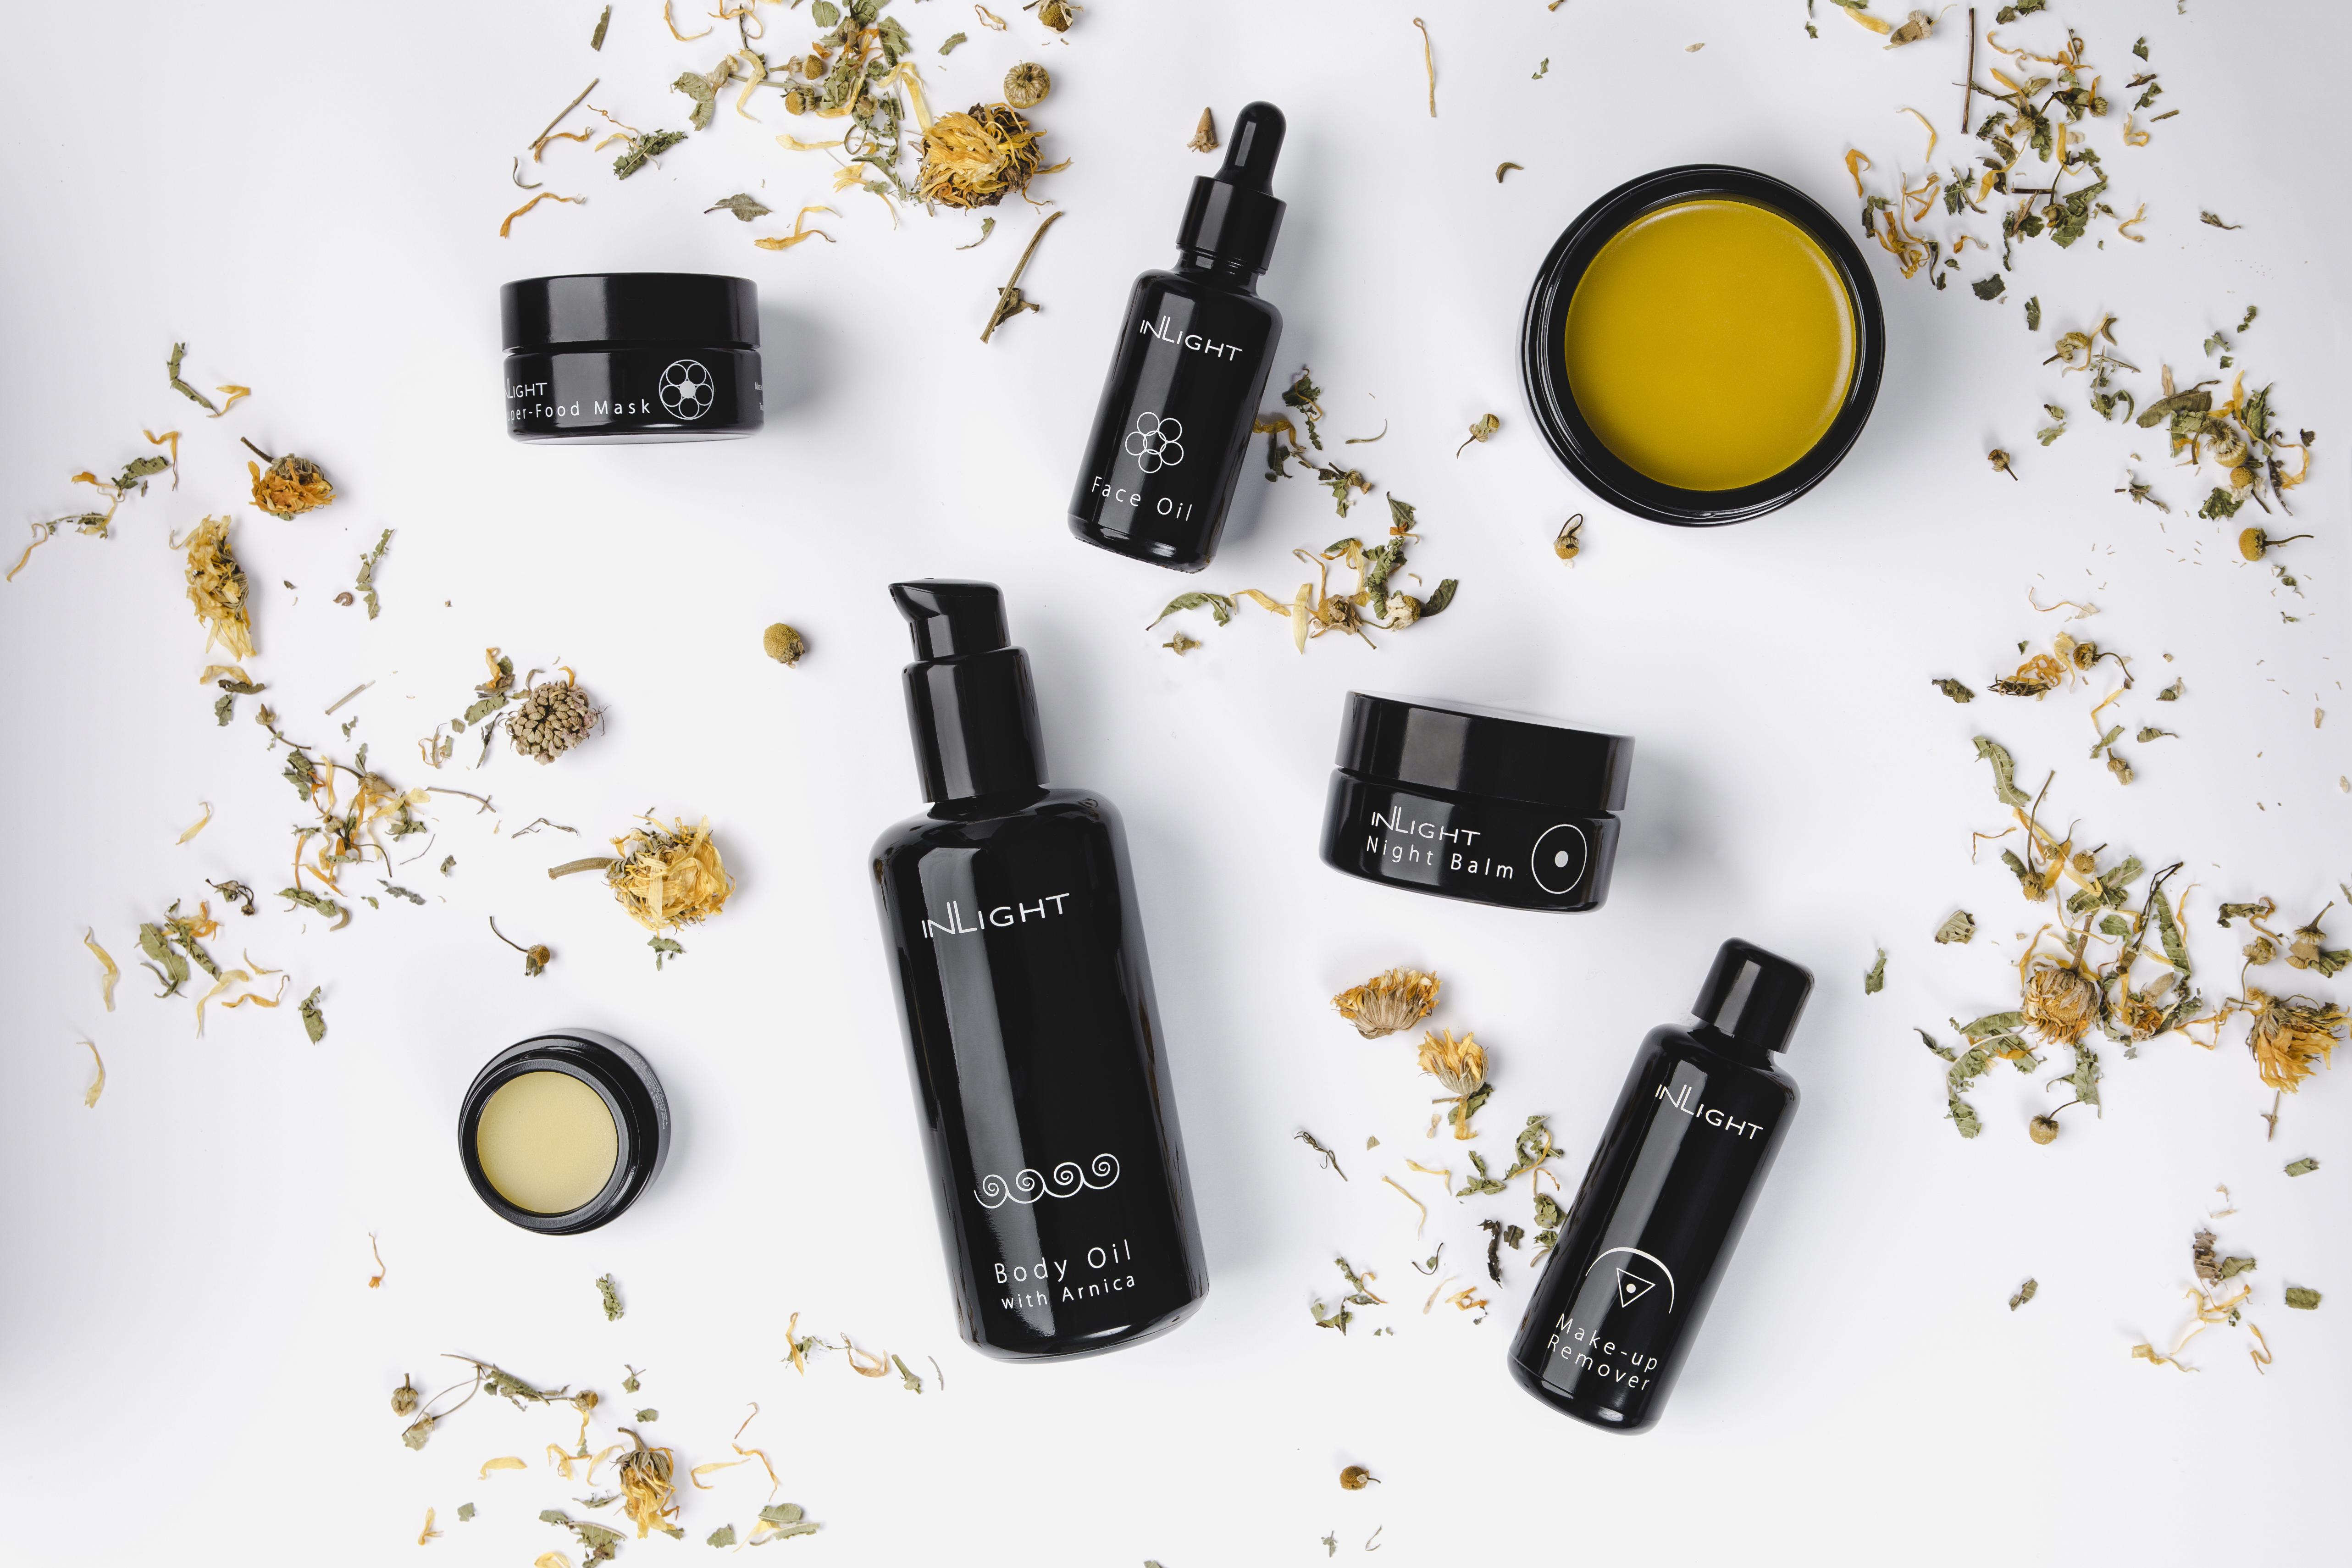 Inlight: Poznejte 100% bio kosmetiku z bylin a rostlinných olejů